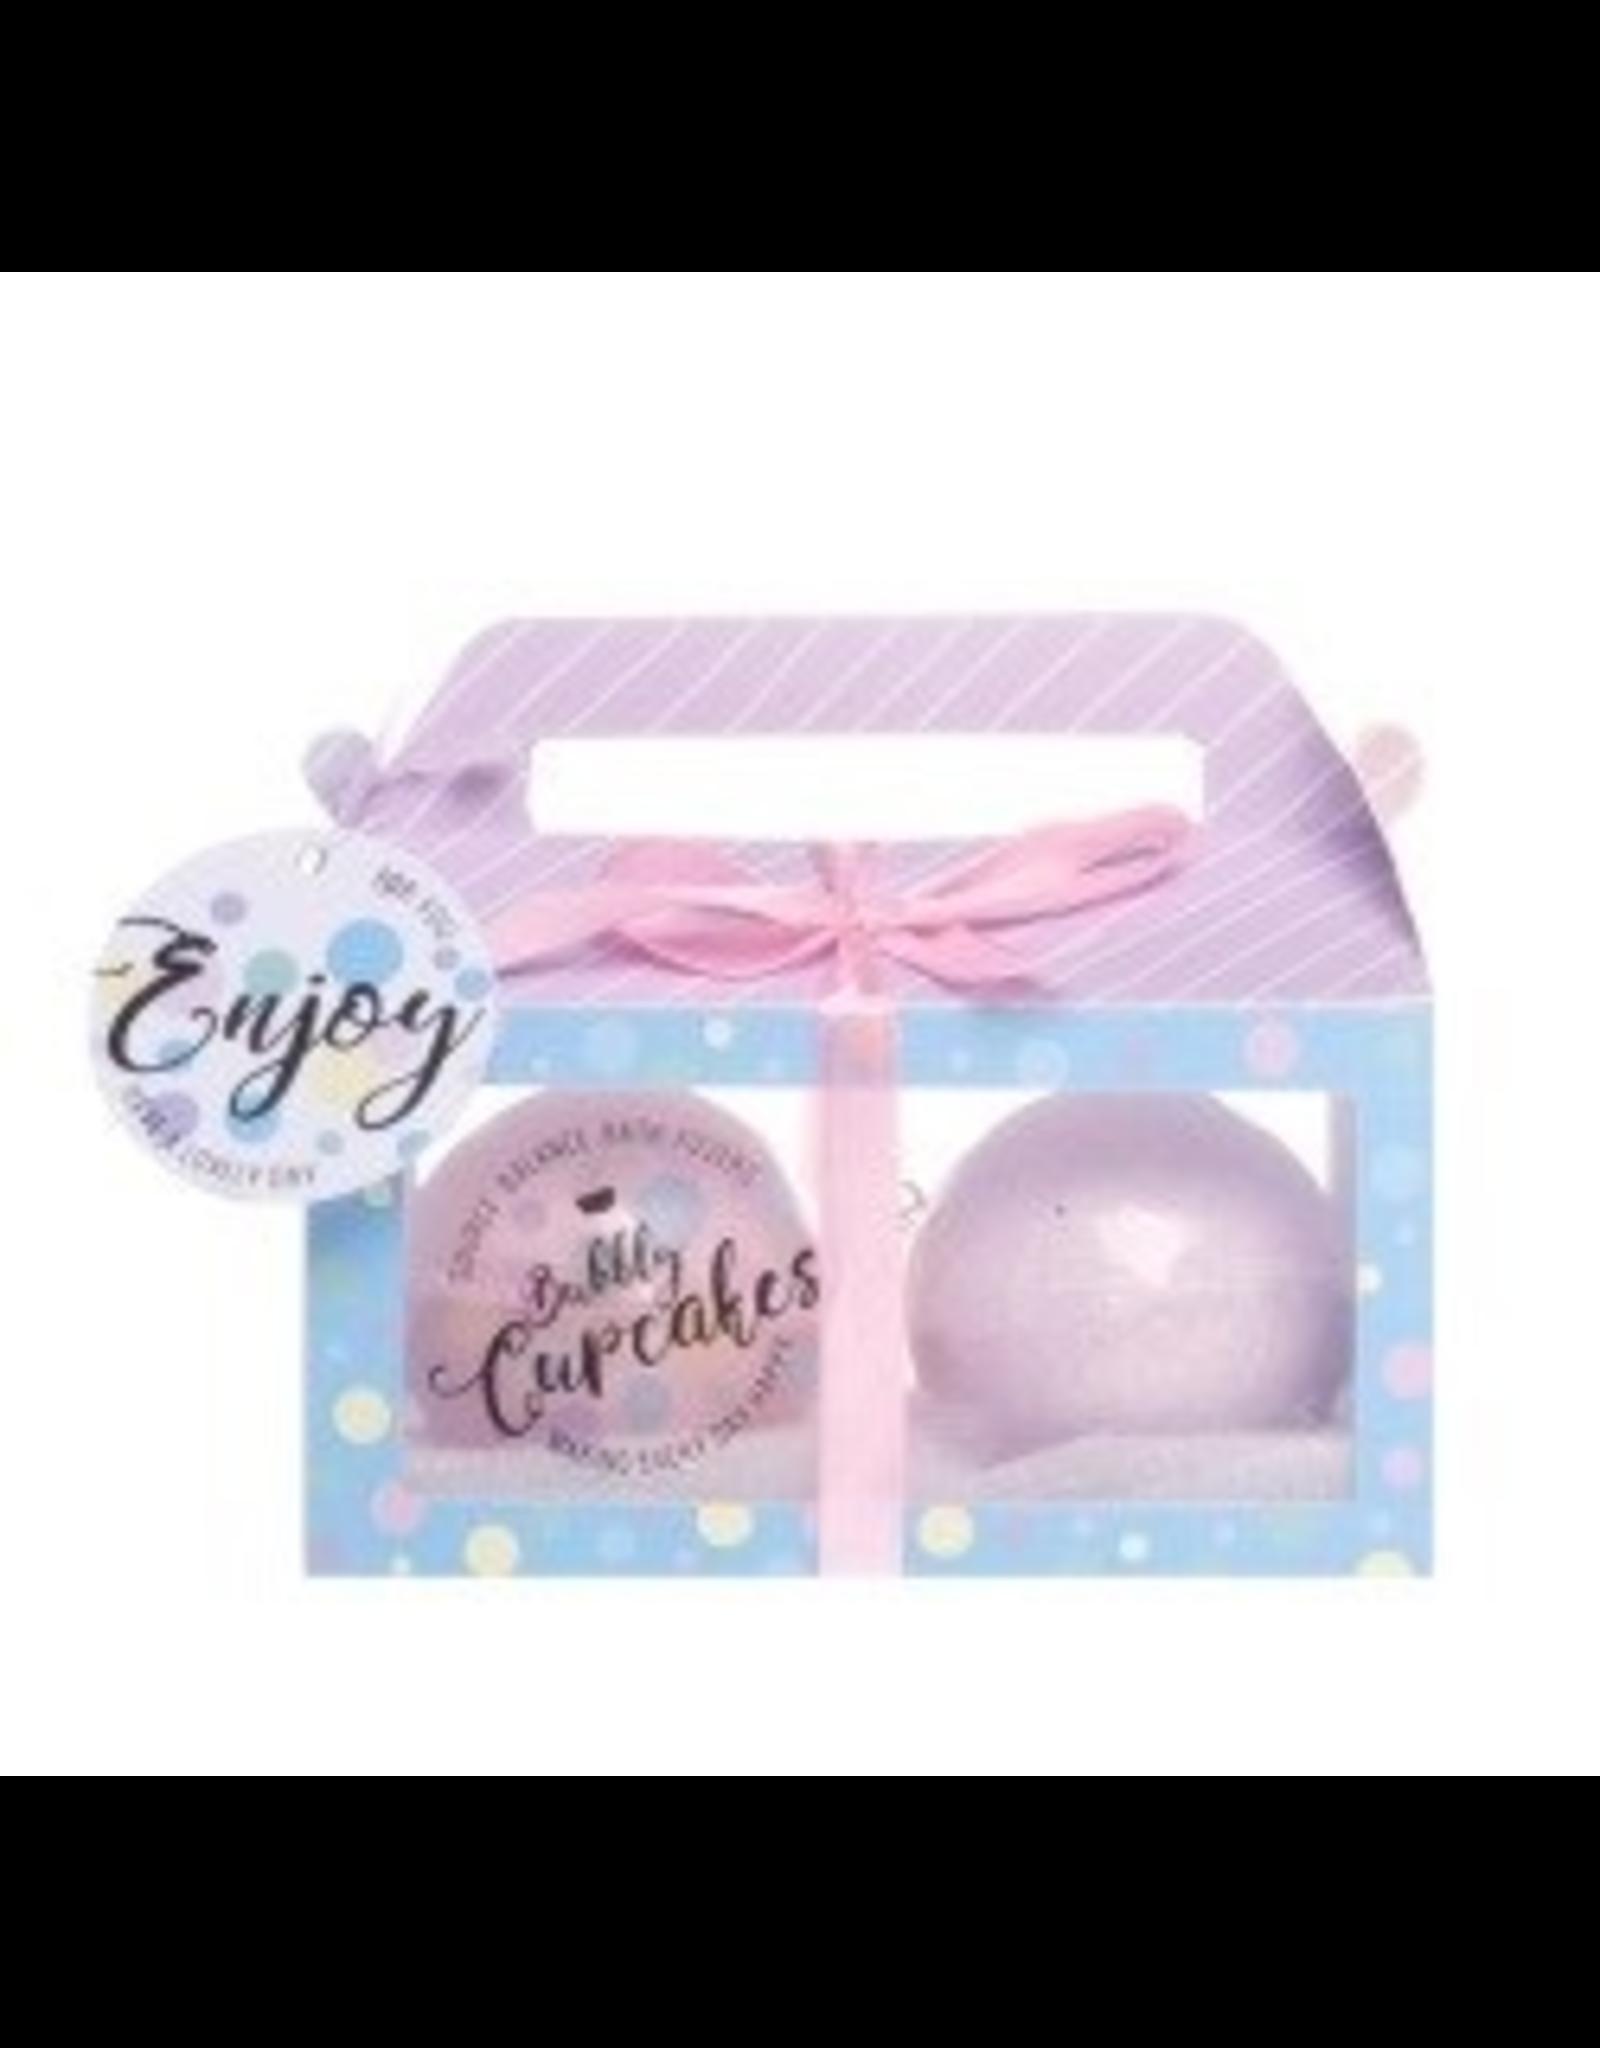 Cake House 2 badbruisballen geschenkset - Body & Soap